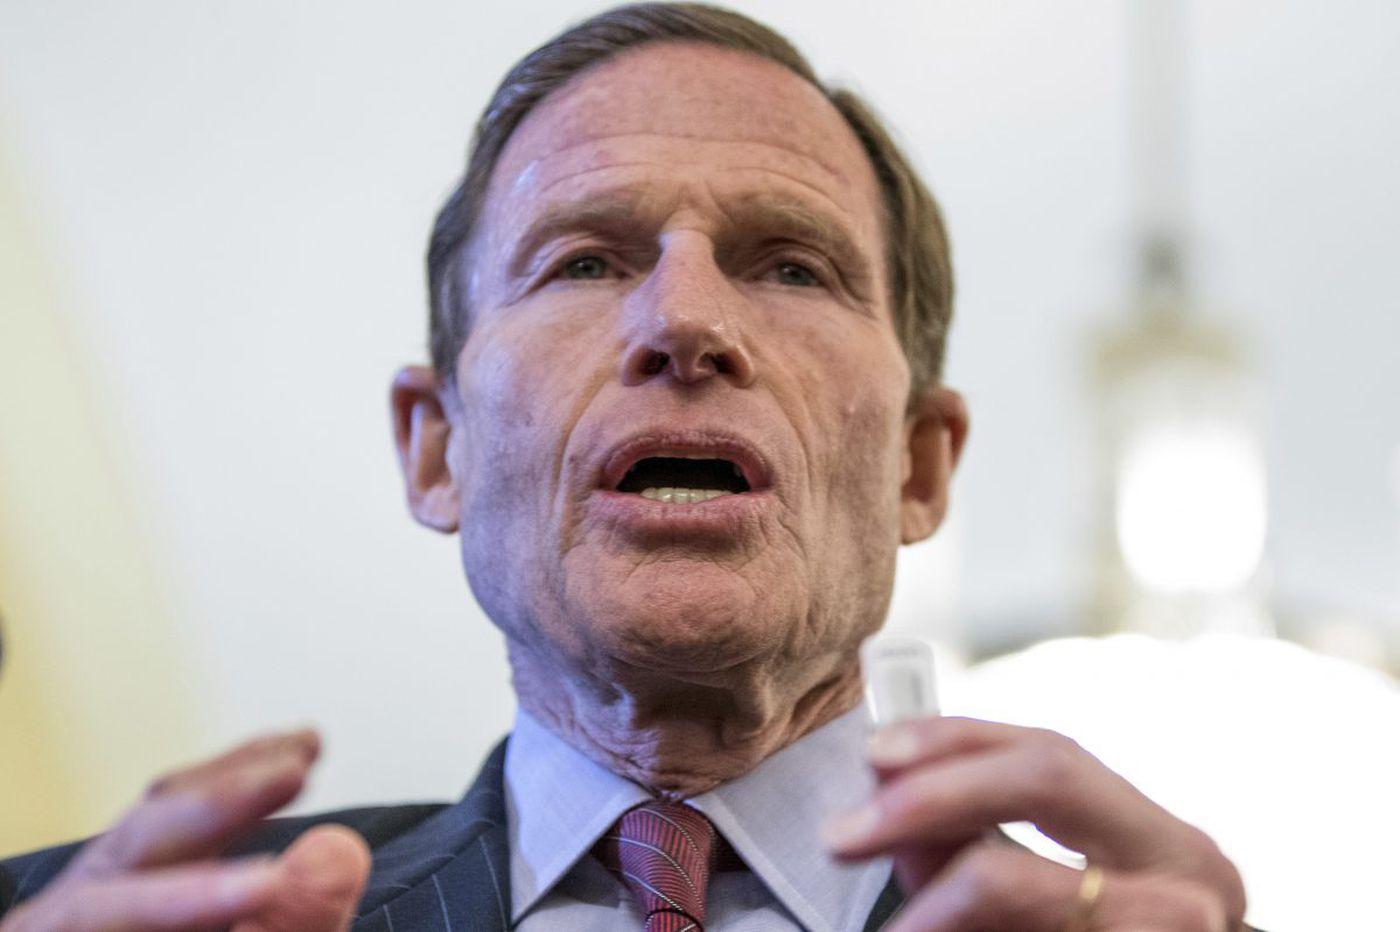 Comcast faces potential Justice probe at Sen. Blumenthal's urging